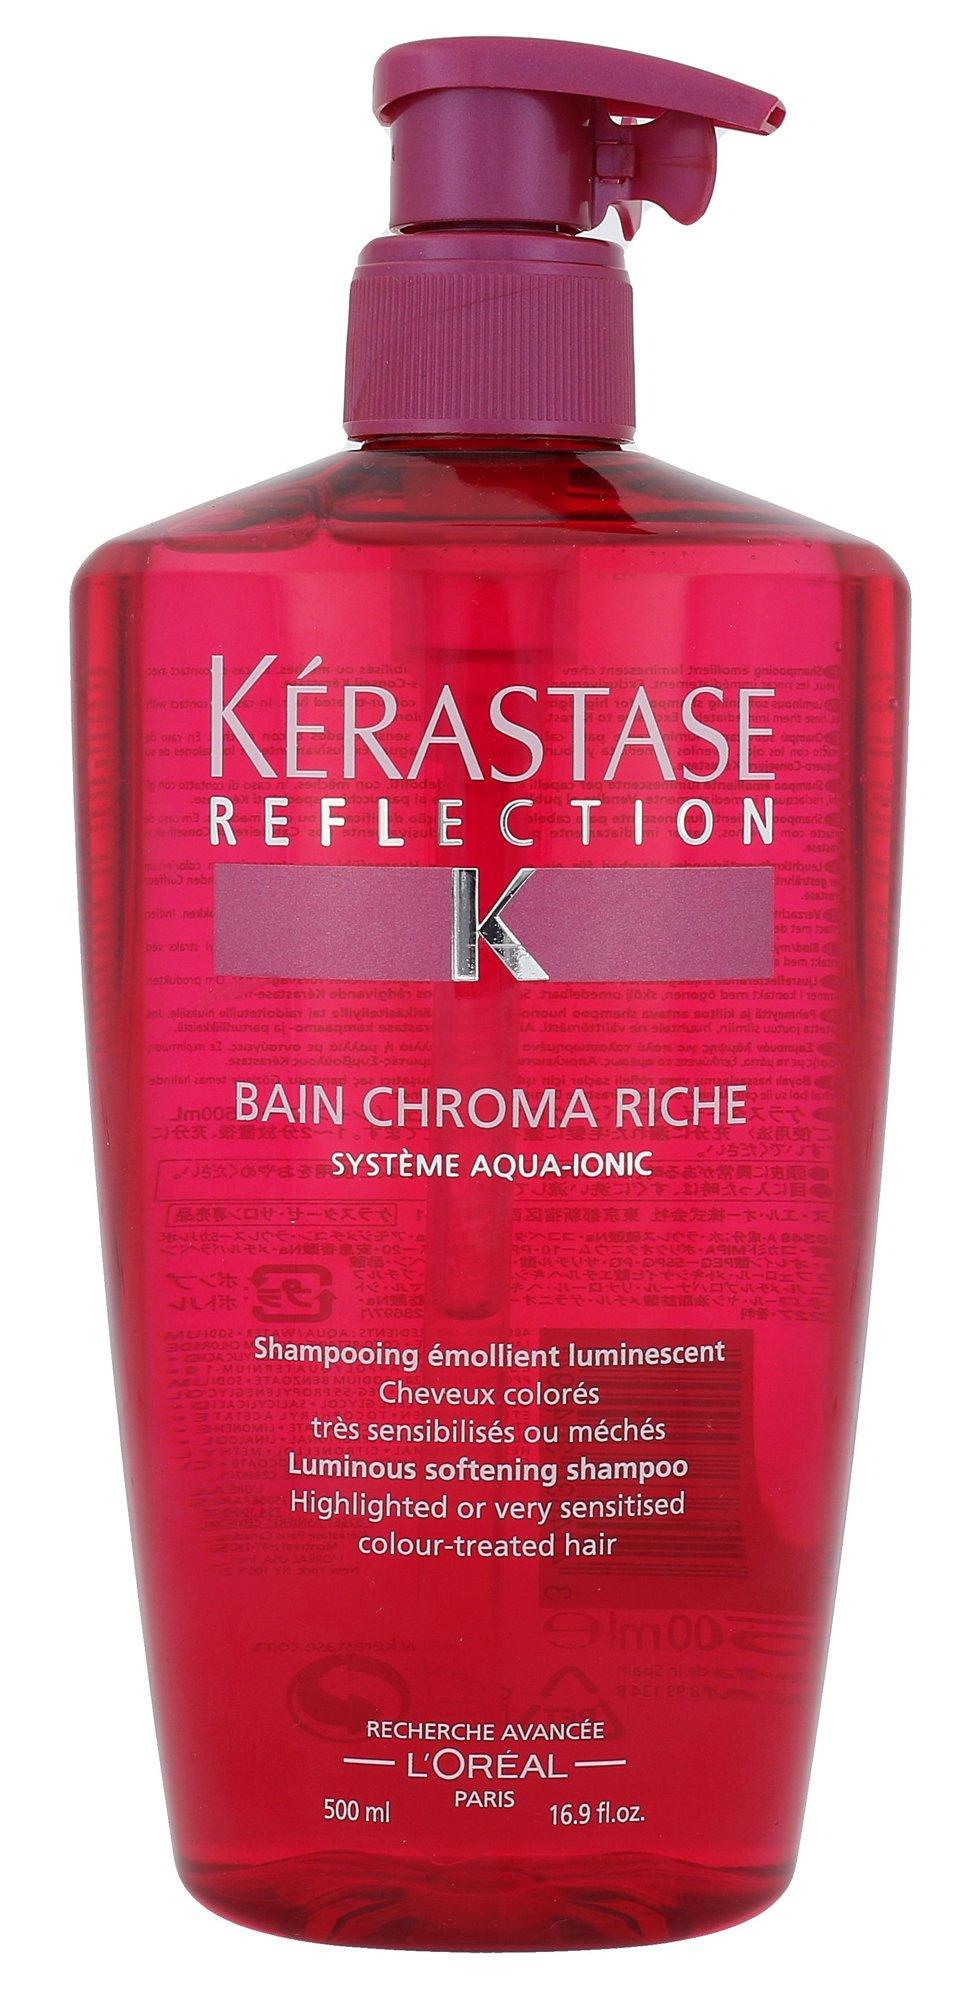 Kérastase Réflection Cosmetic 500ml